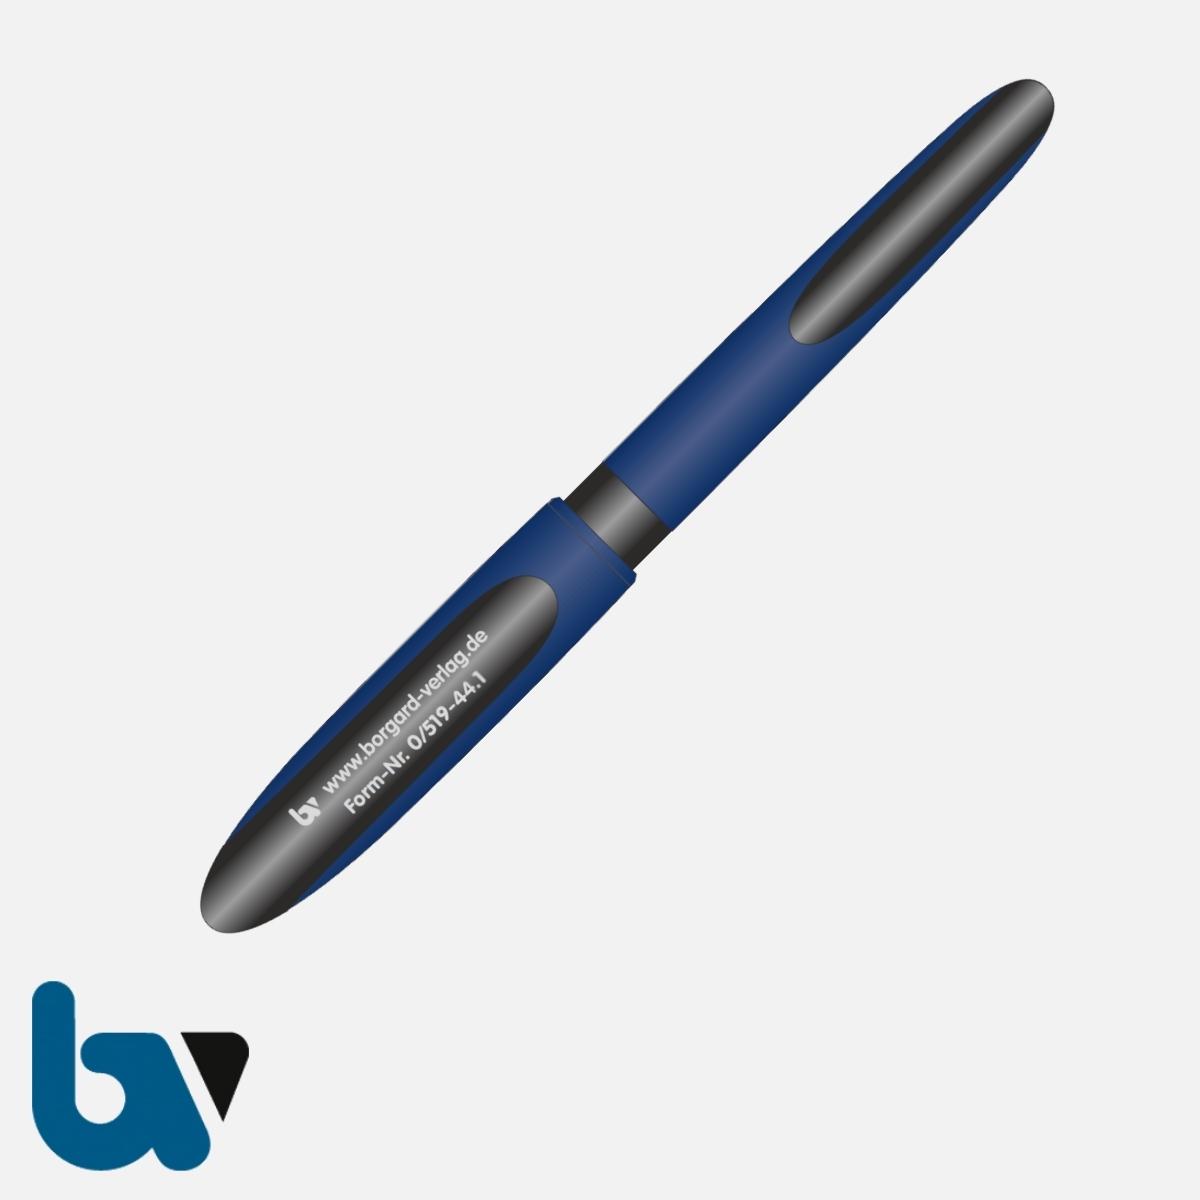 0/519-44.1 Tintenroller One Business blau dokumentenecht 1 | Borgard Verlag GmbH